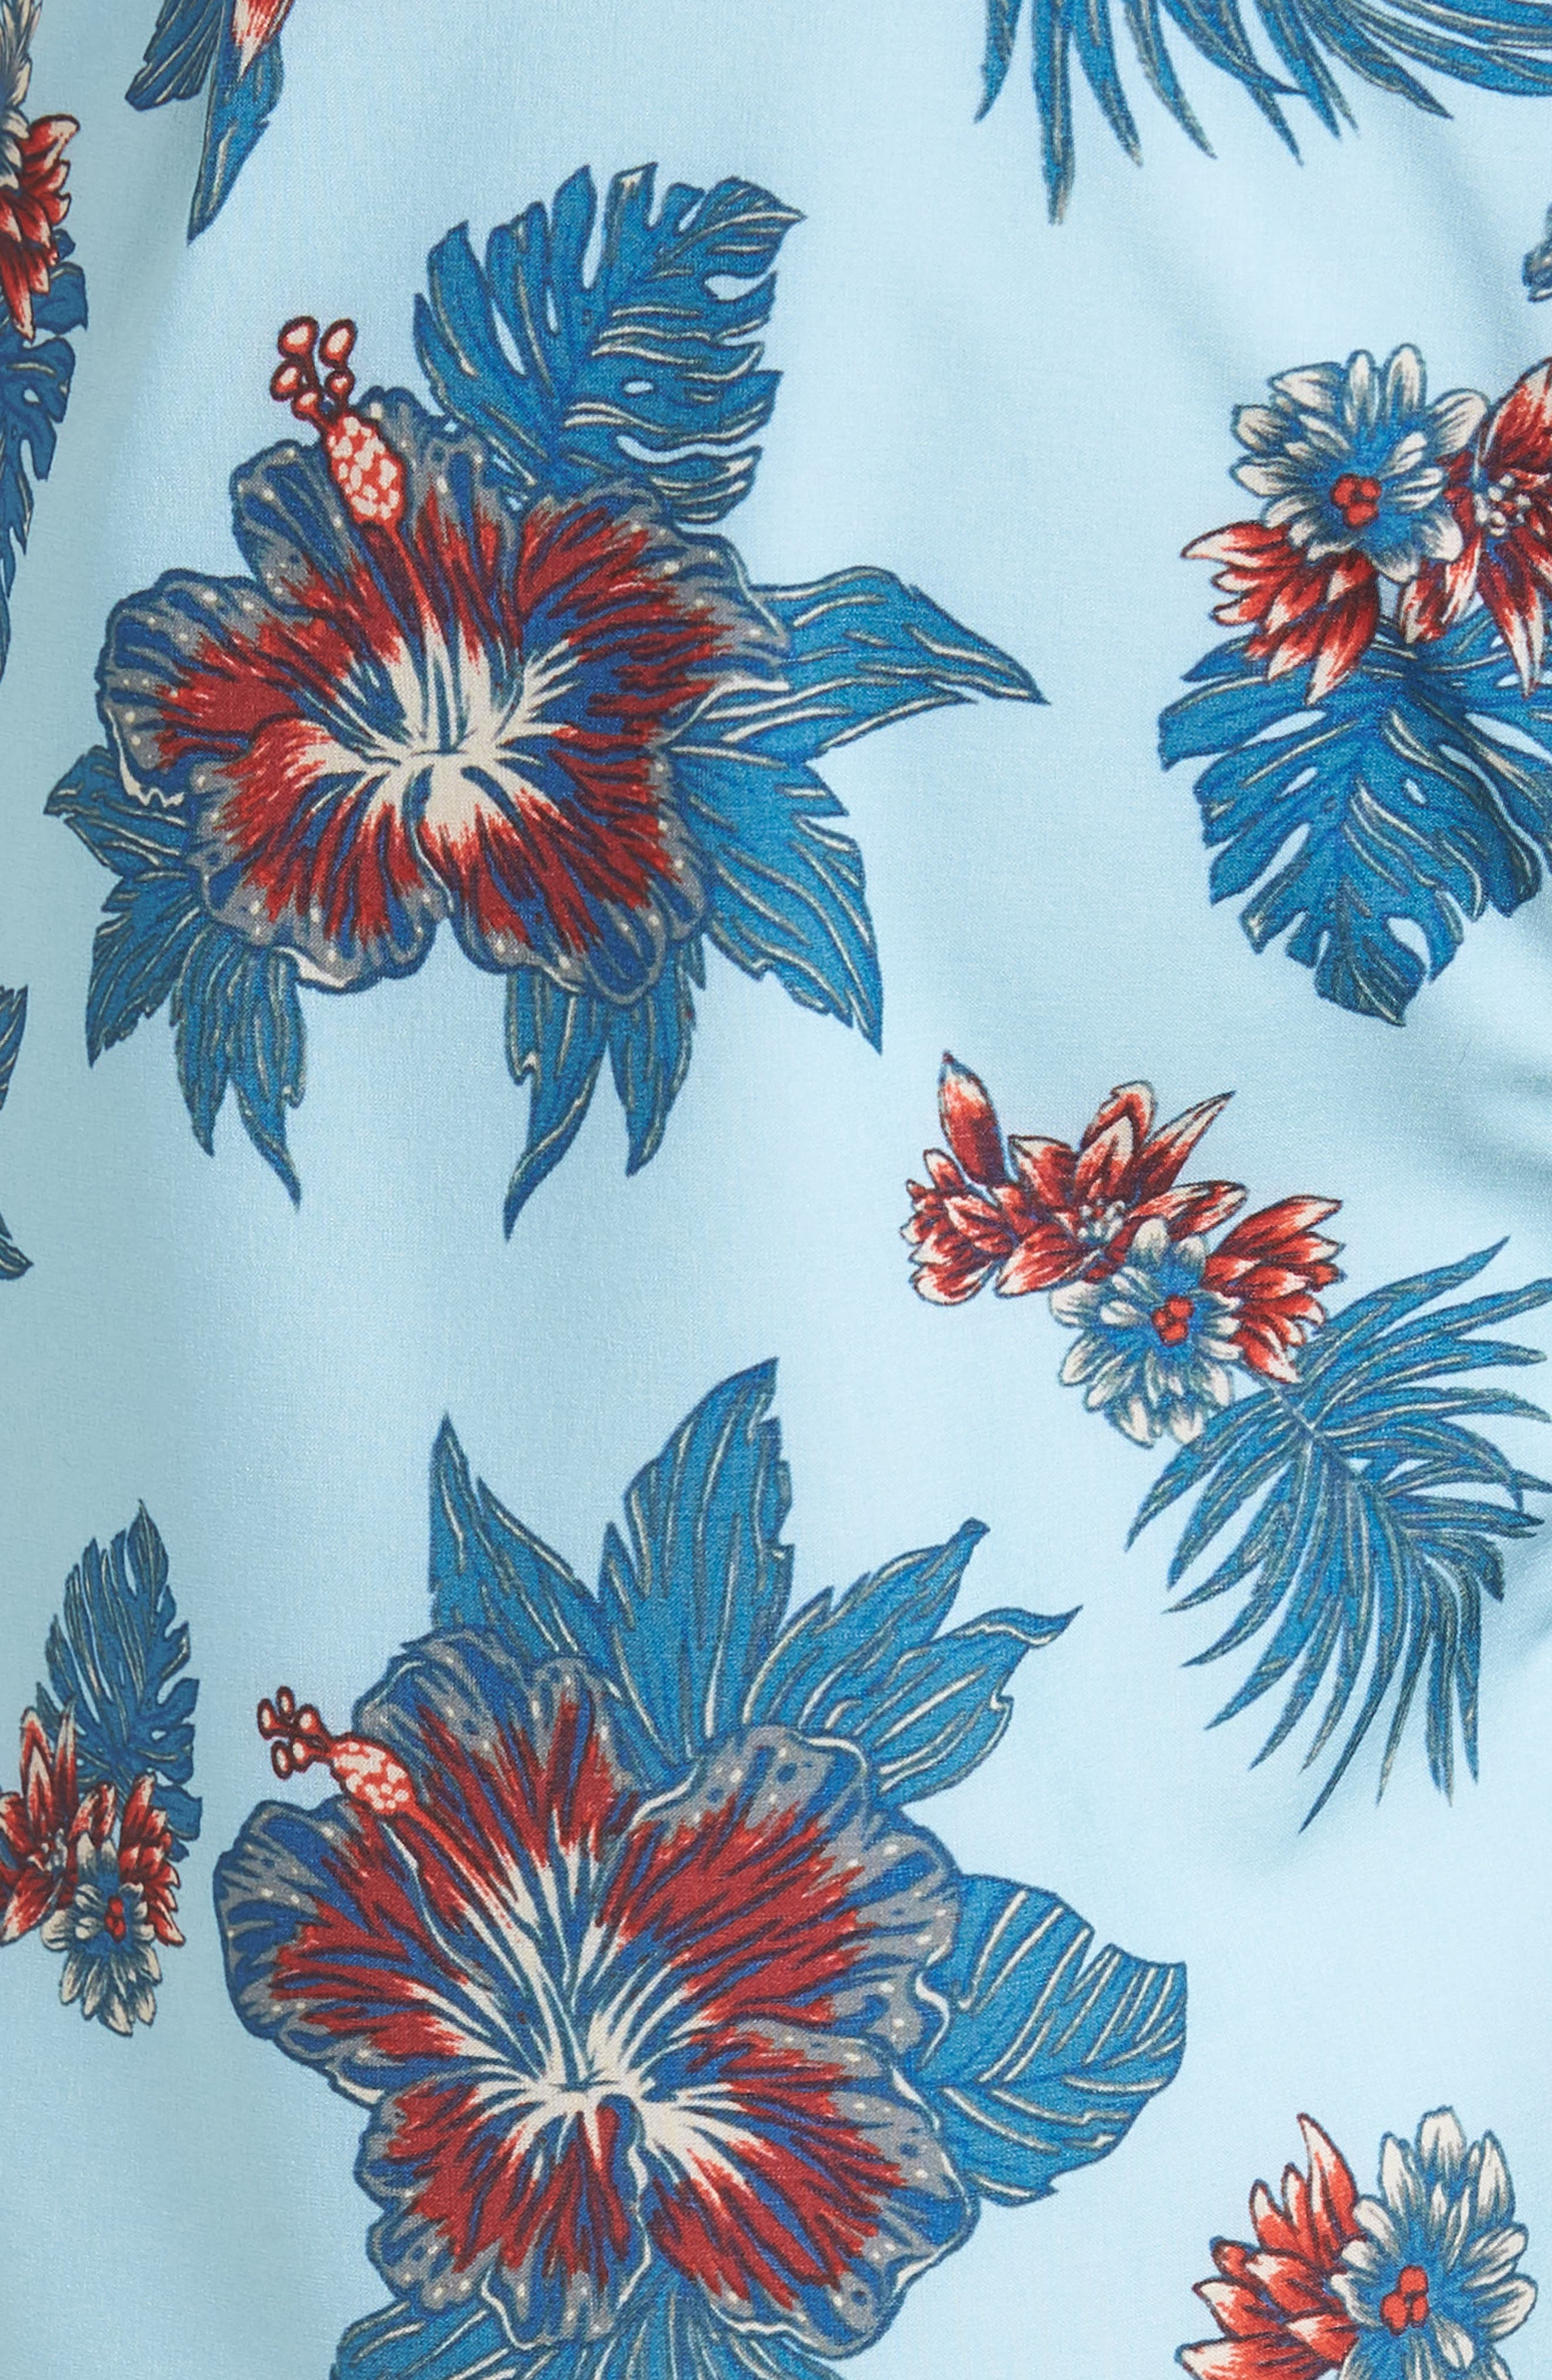 Jeff McMillan Floral Swim Trunks,                             Alternate thumbnail 5, color,                             Blue Floral